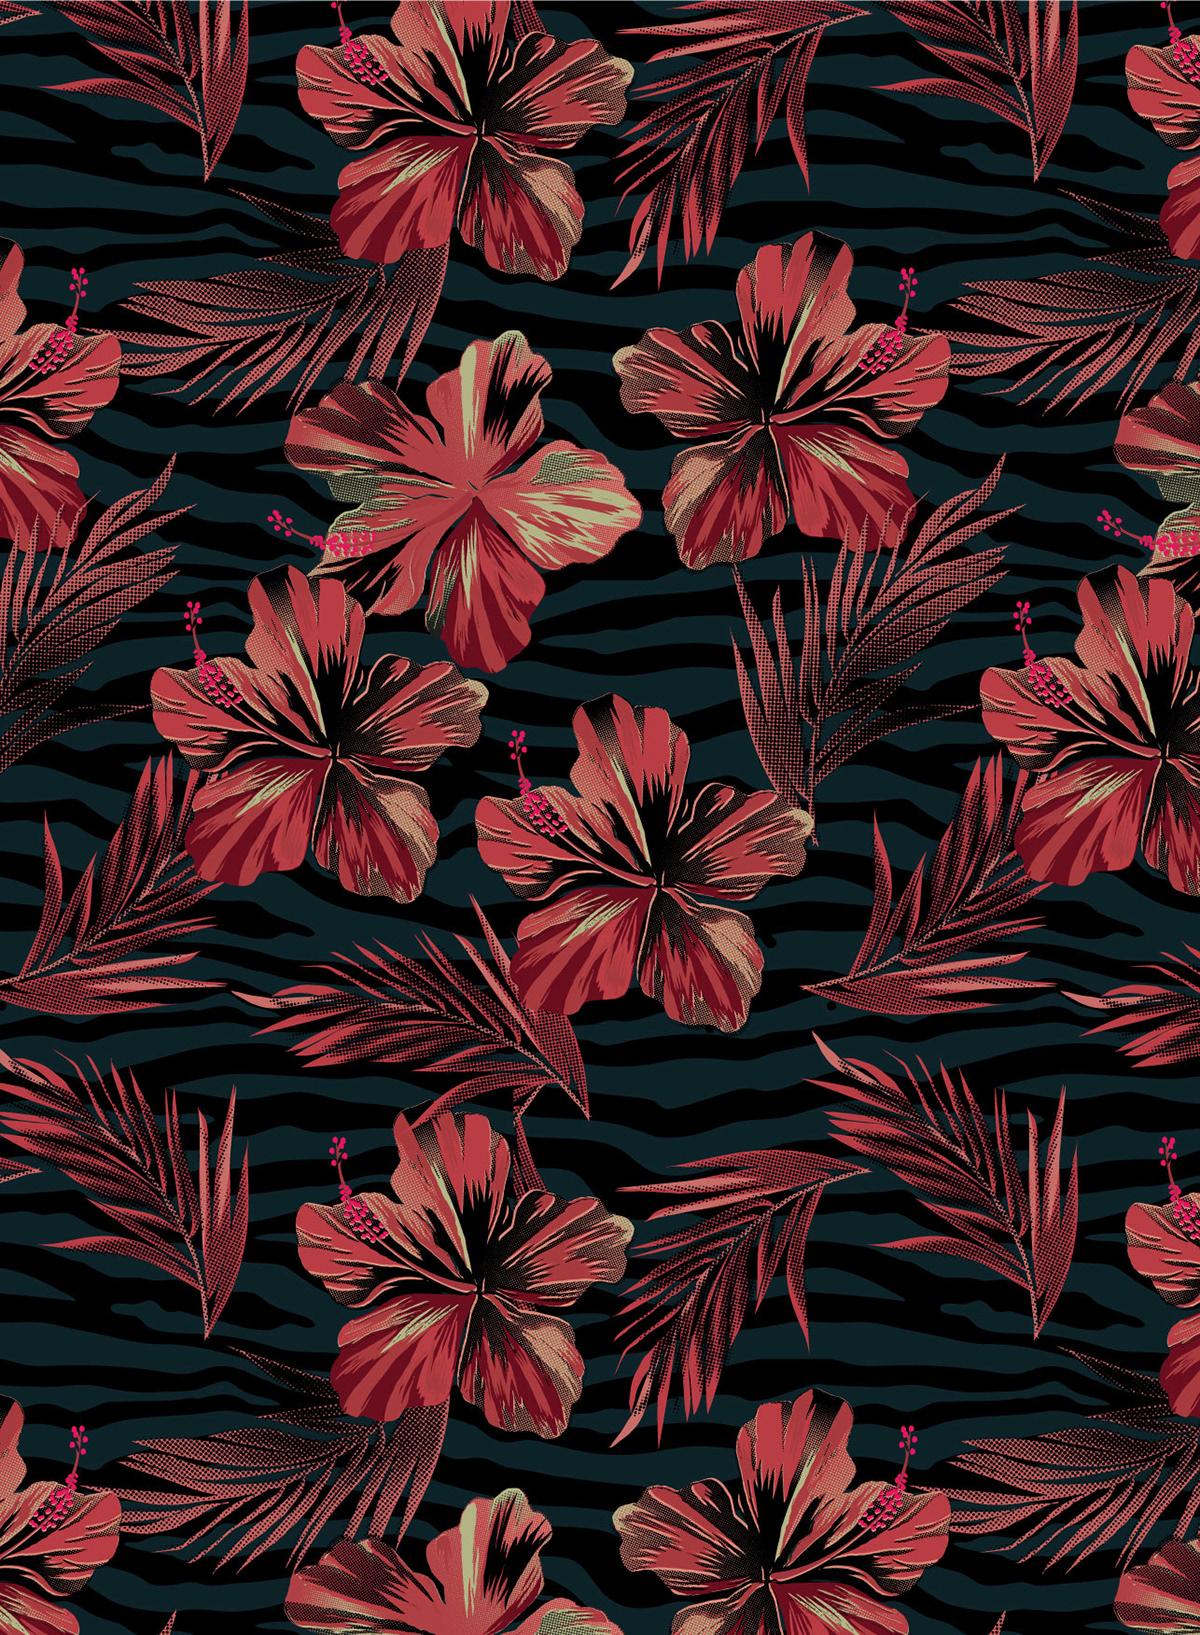 Dark Floral flamingo floral leaves Menswear shirts summer swim Tropical